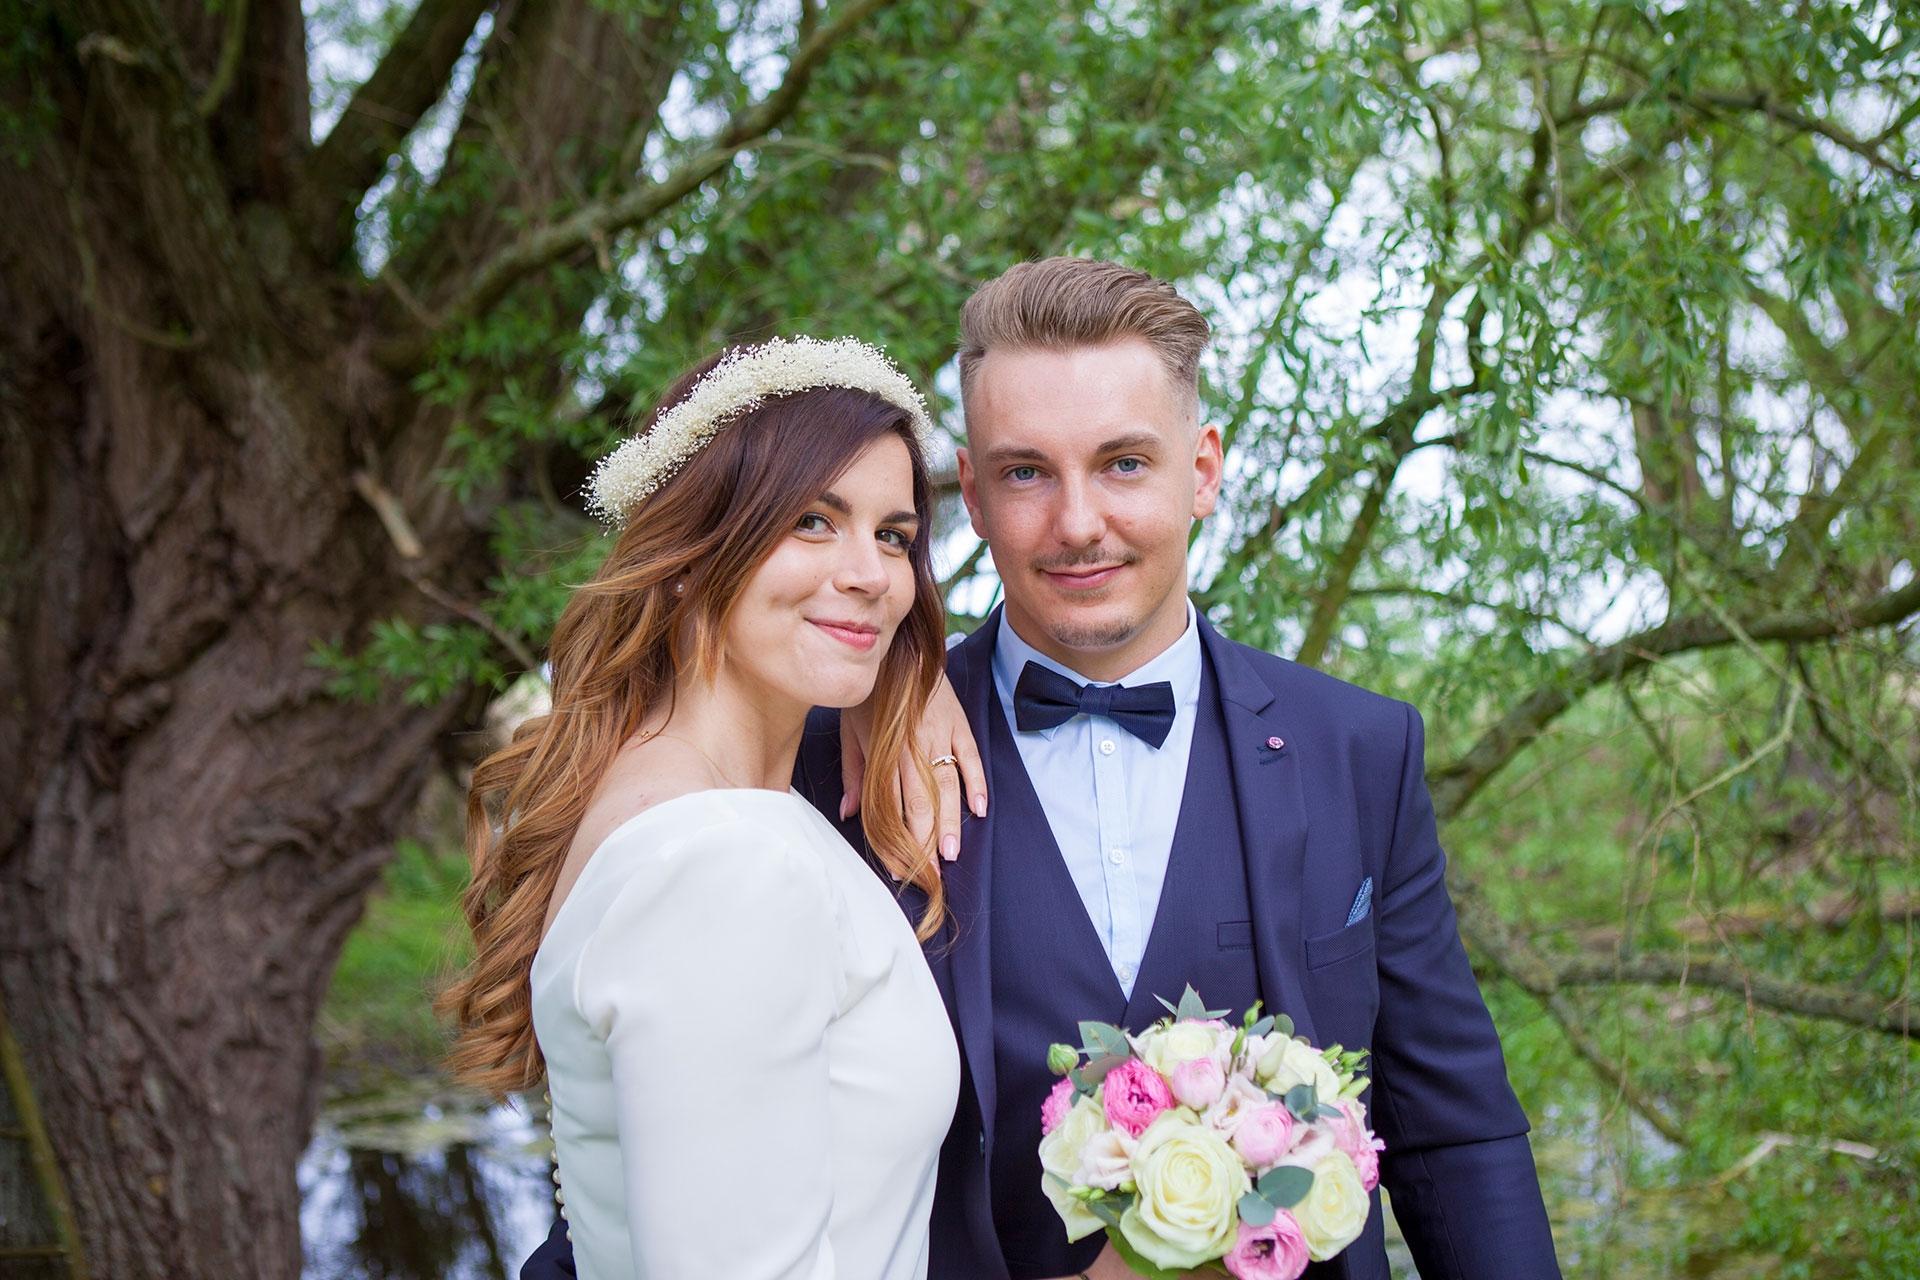 particuliers-evenements-mariages-oui-zelie&valentin-25